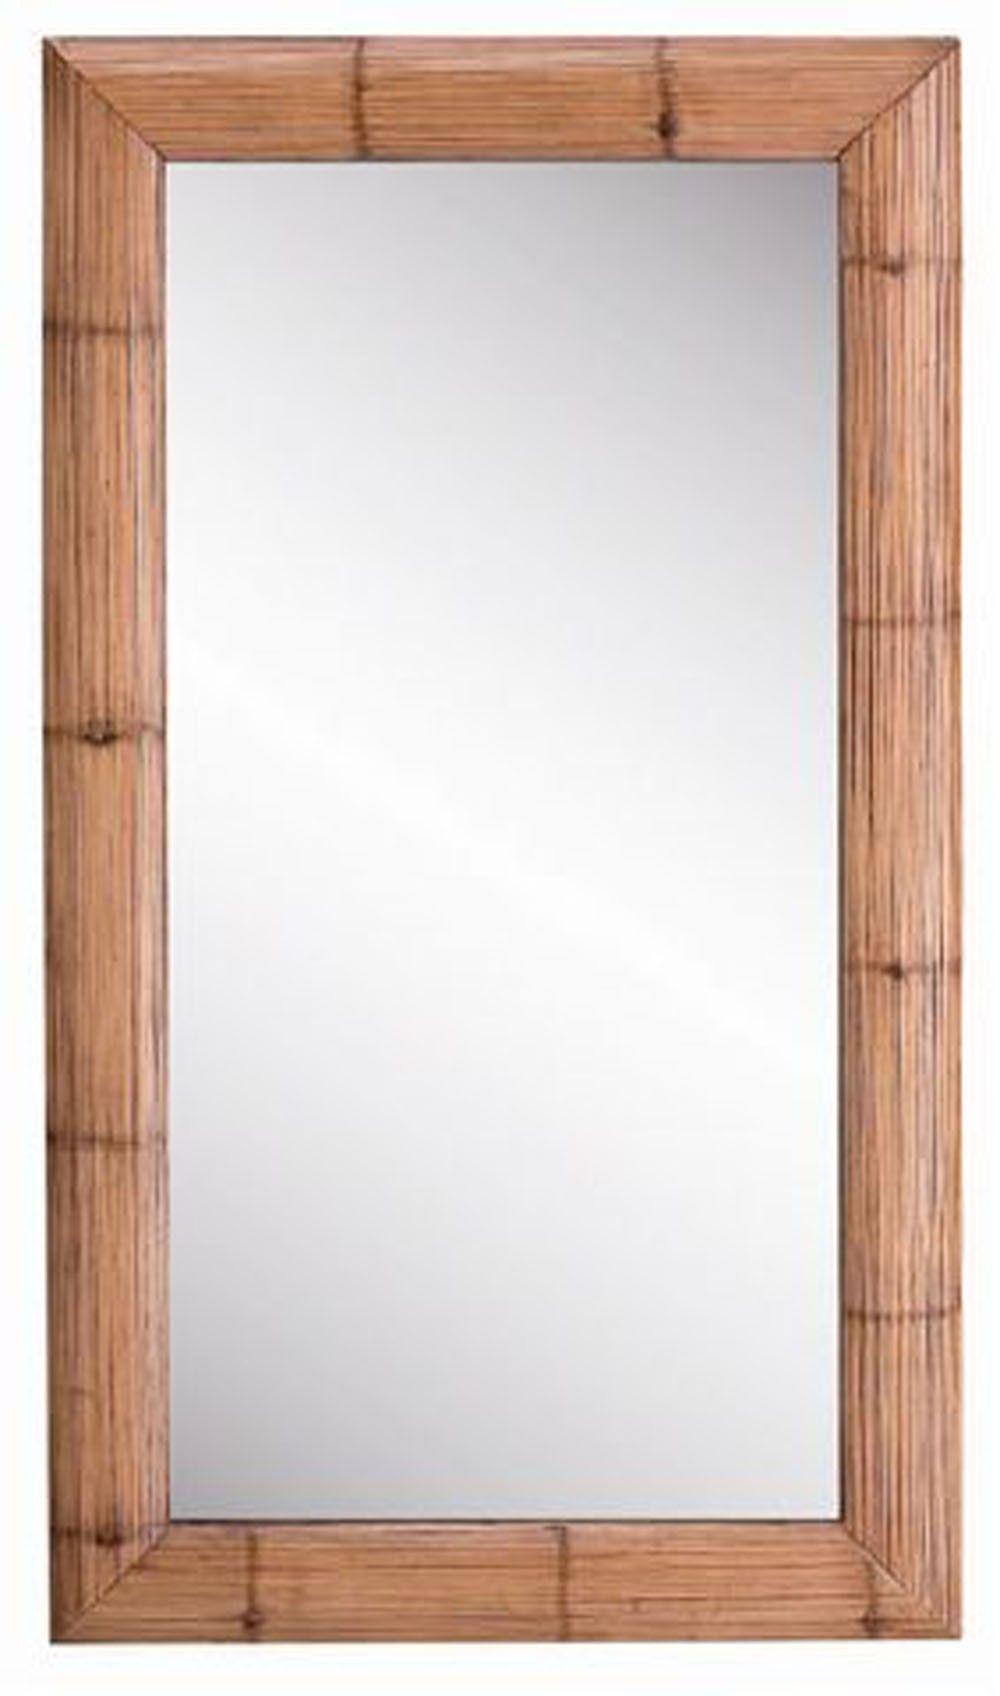 Espejo Compac 318 Www Thoiti Com Bamboo Furniture Furniture Interior